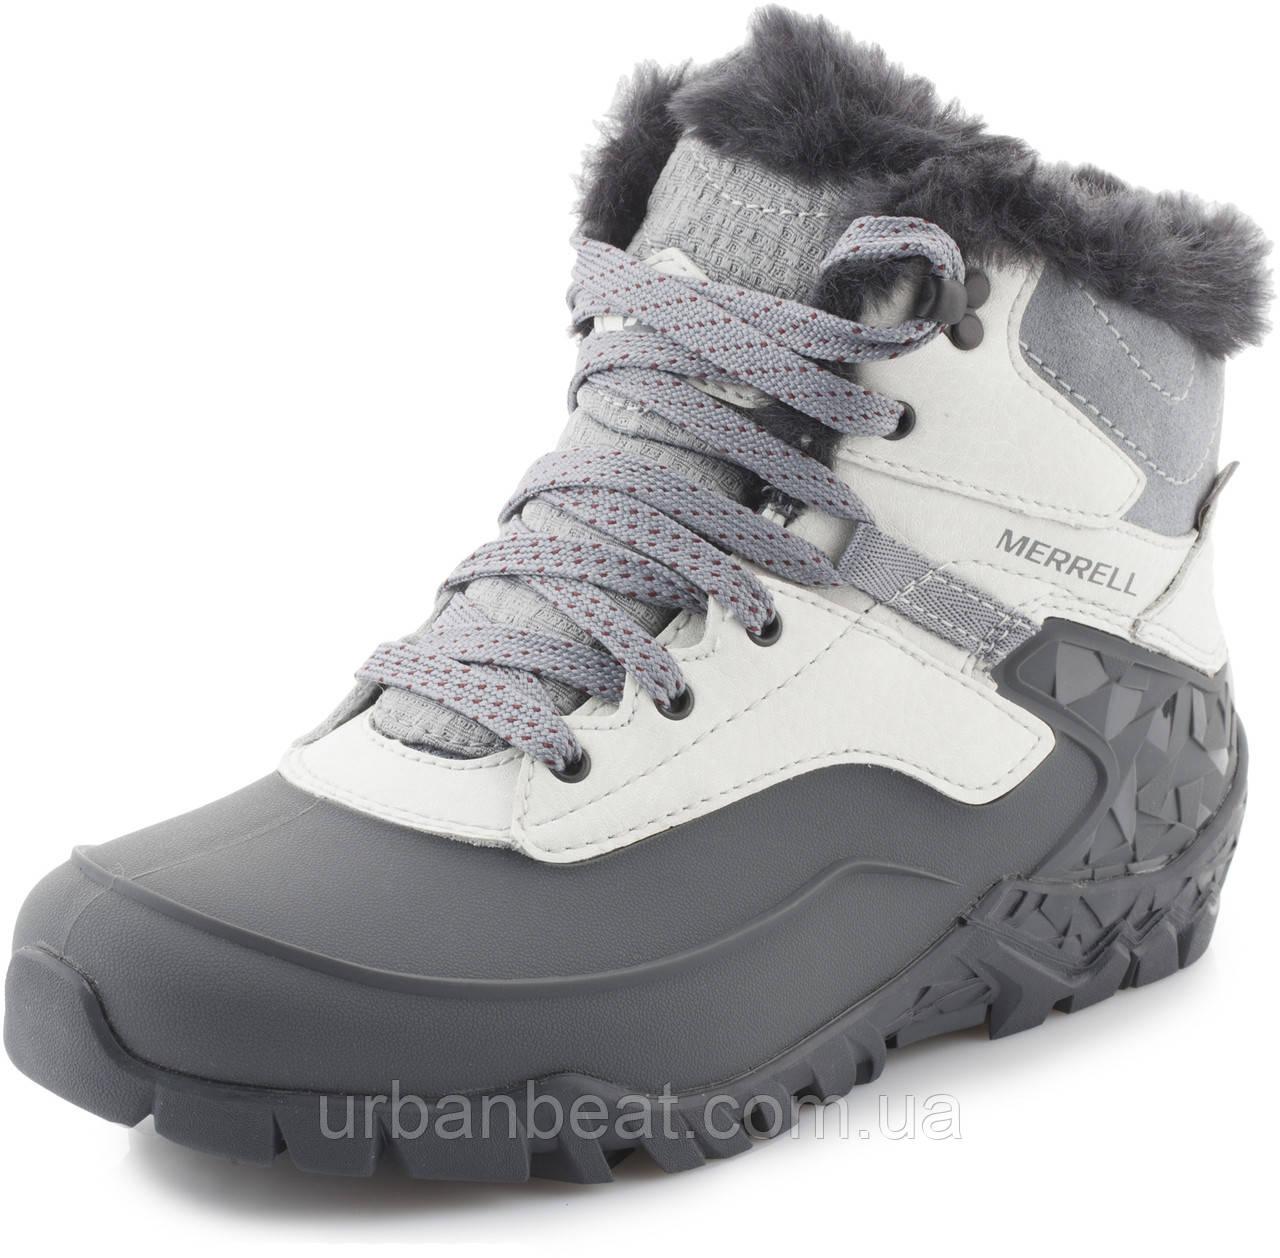 Женские ботинки Merrell Aurora 6 Ice+Waterproof j37224 c1ad336427cc6